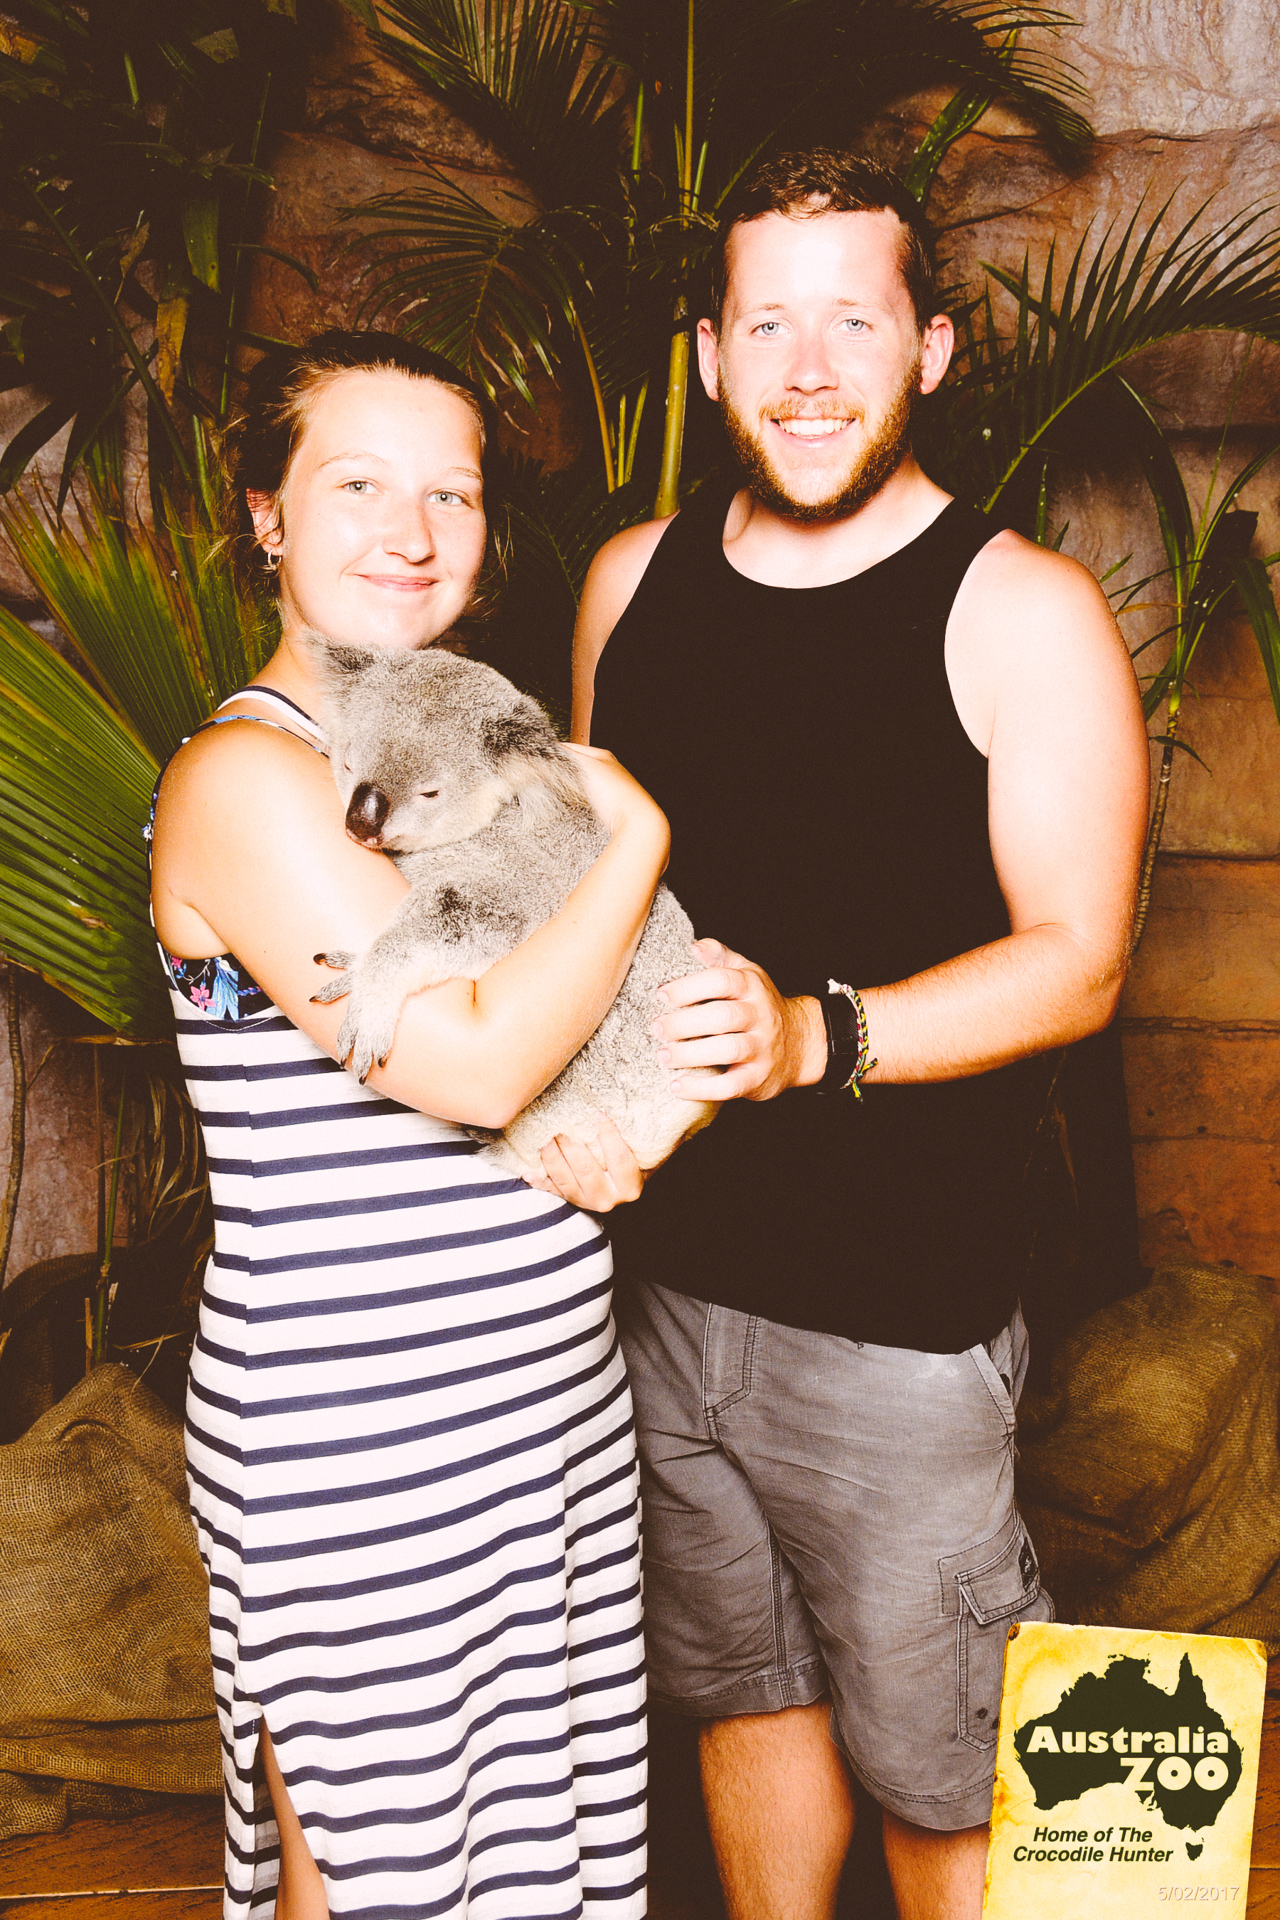 Alis holding Koala at Australia Zoo